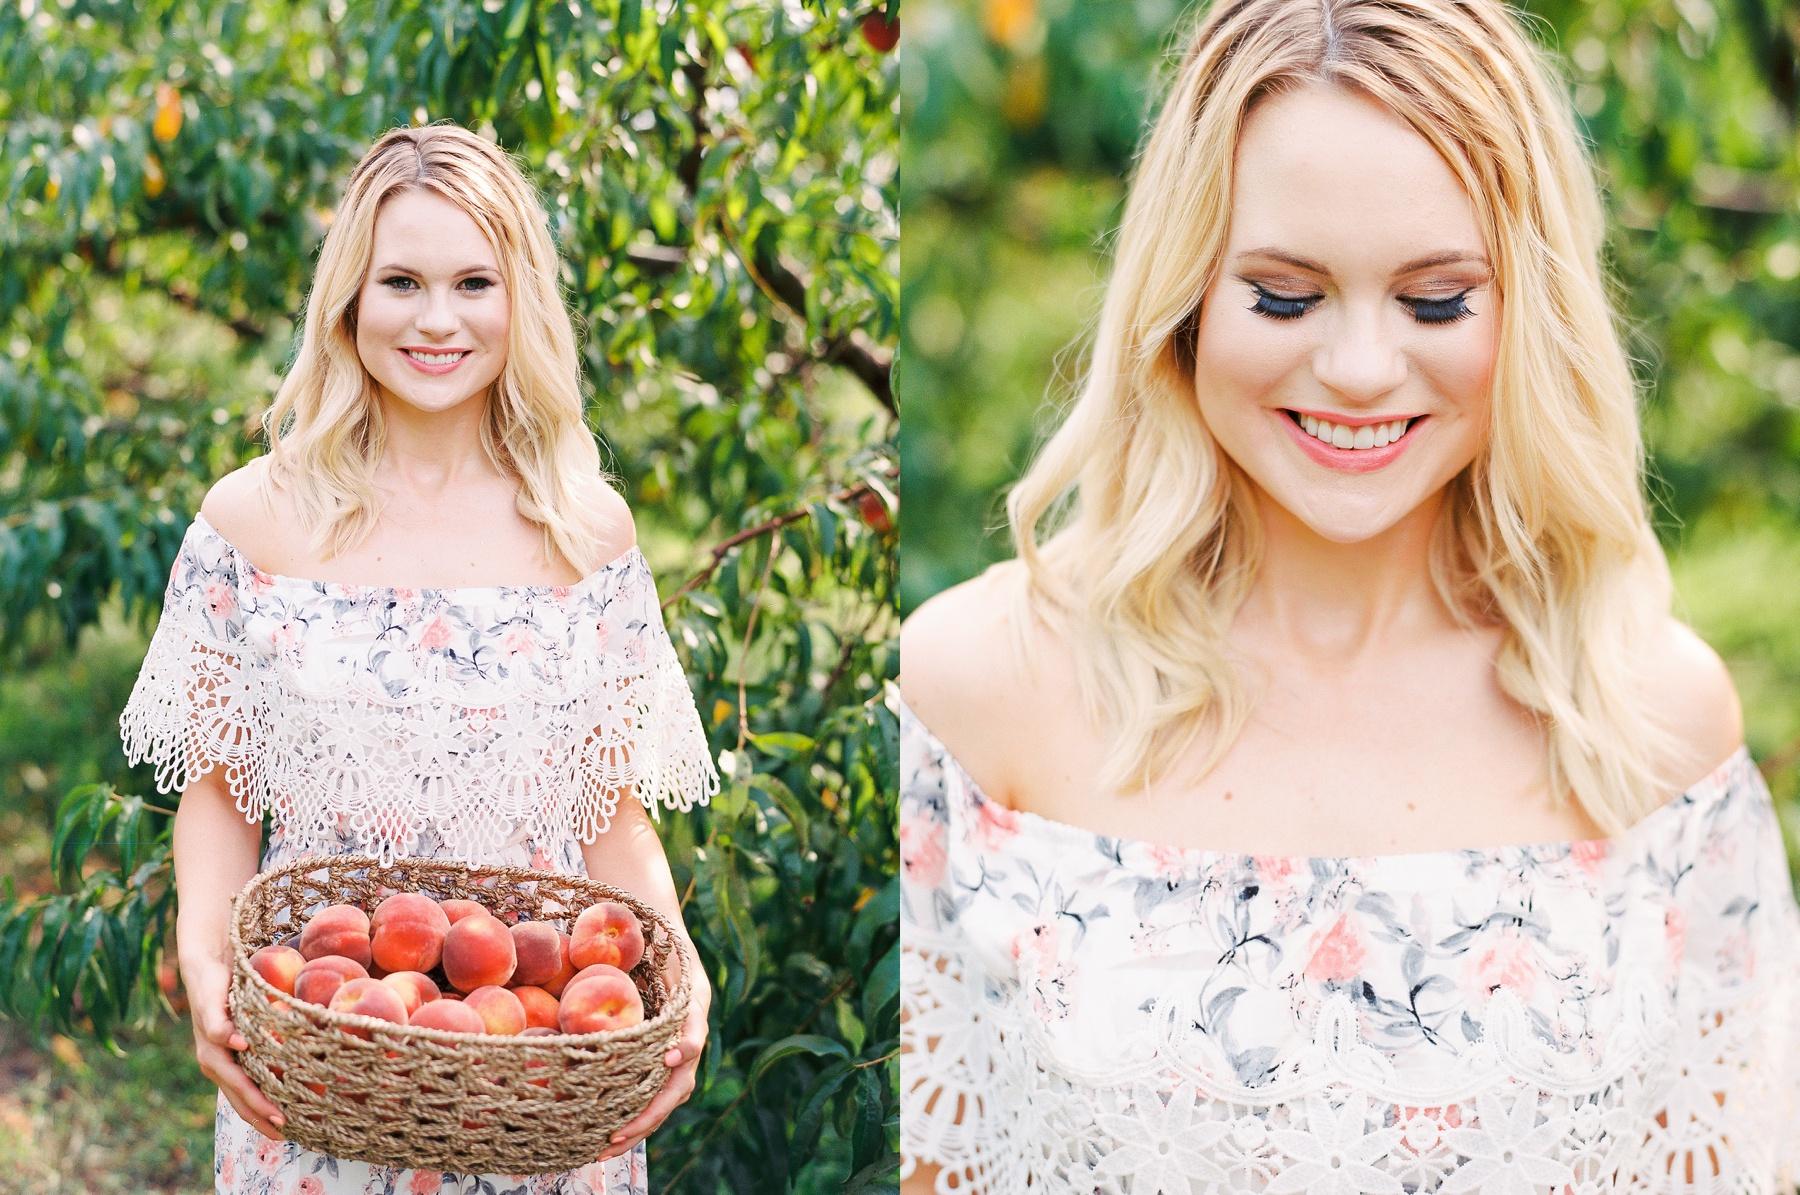 Peach-Orchard-Engagement-Session-Arkansas_0020.jpg